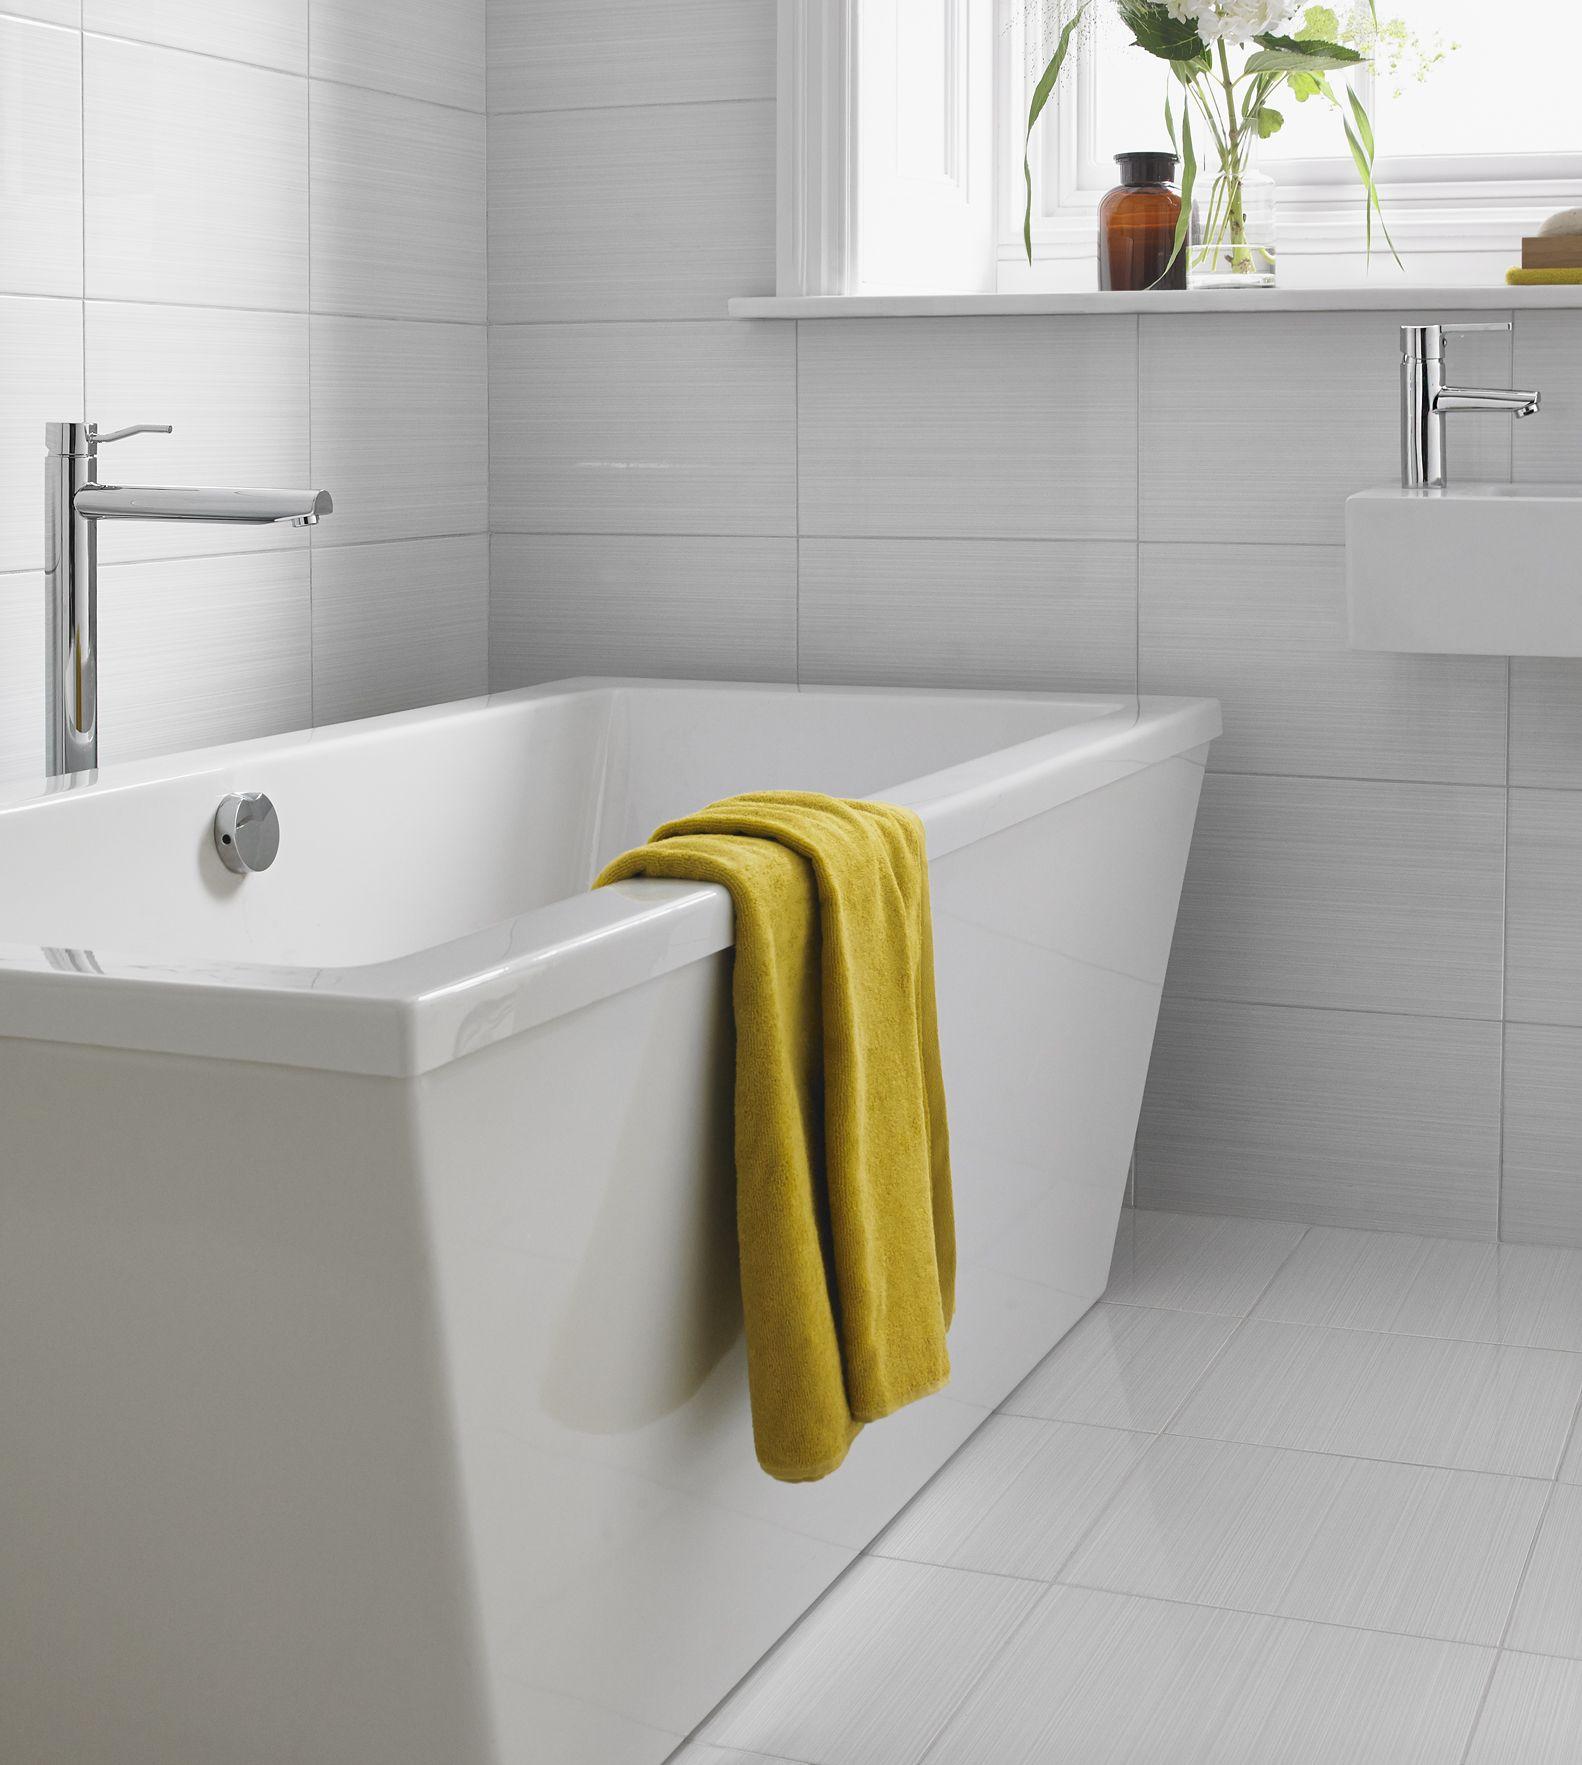 Blairlock White Floor Tile and Wall Tile Styling | Blairlock White ...